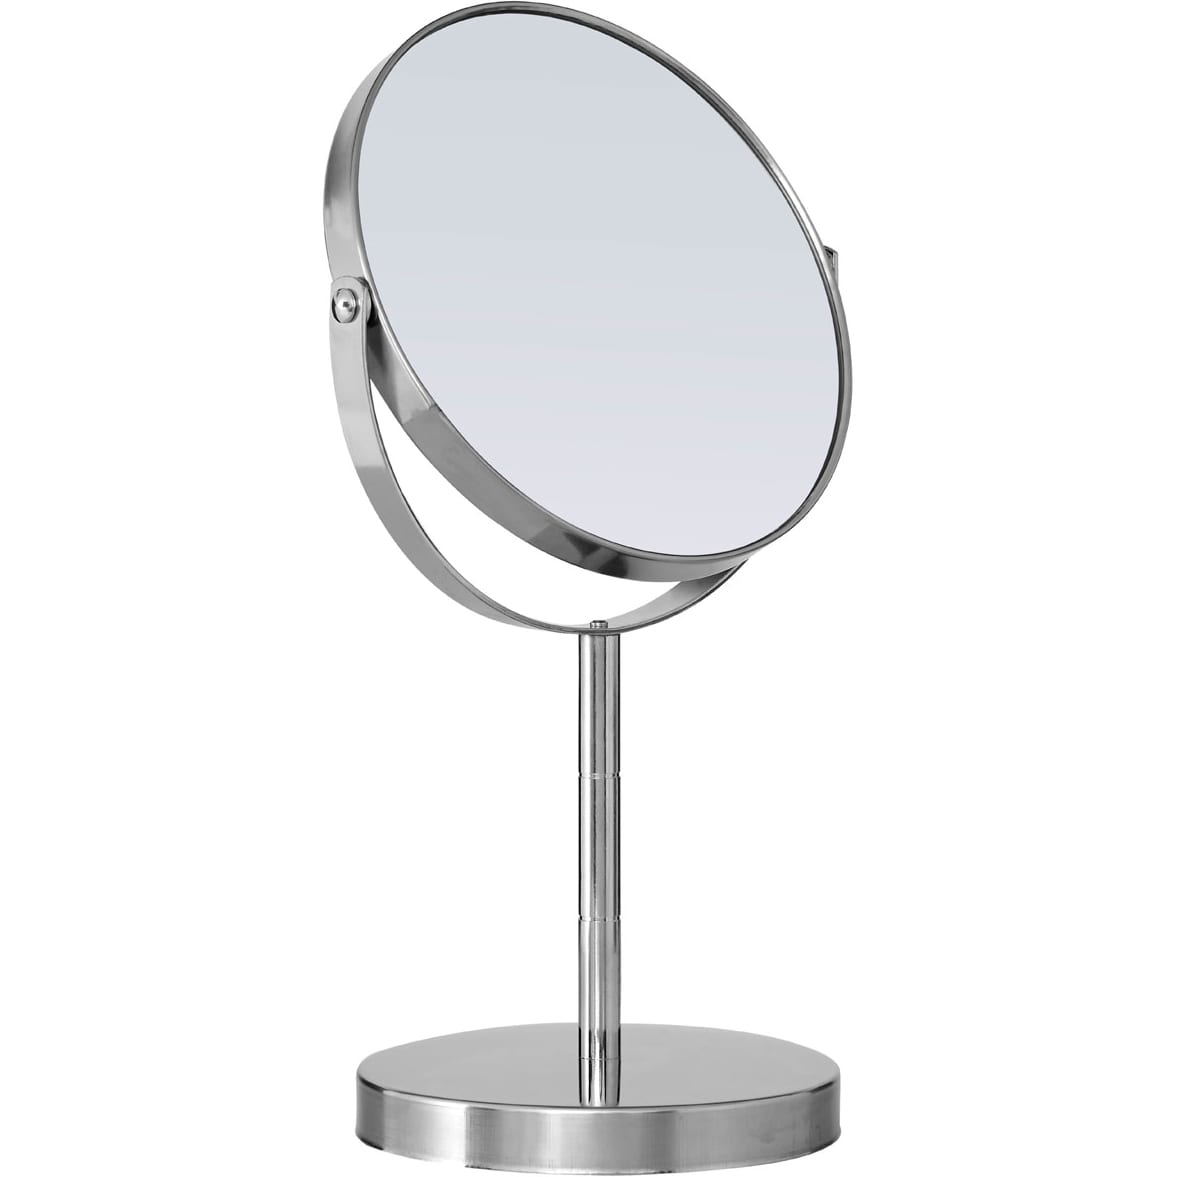 Stainless Steel Swivel Table Mirror